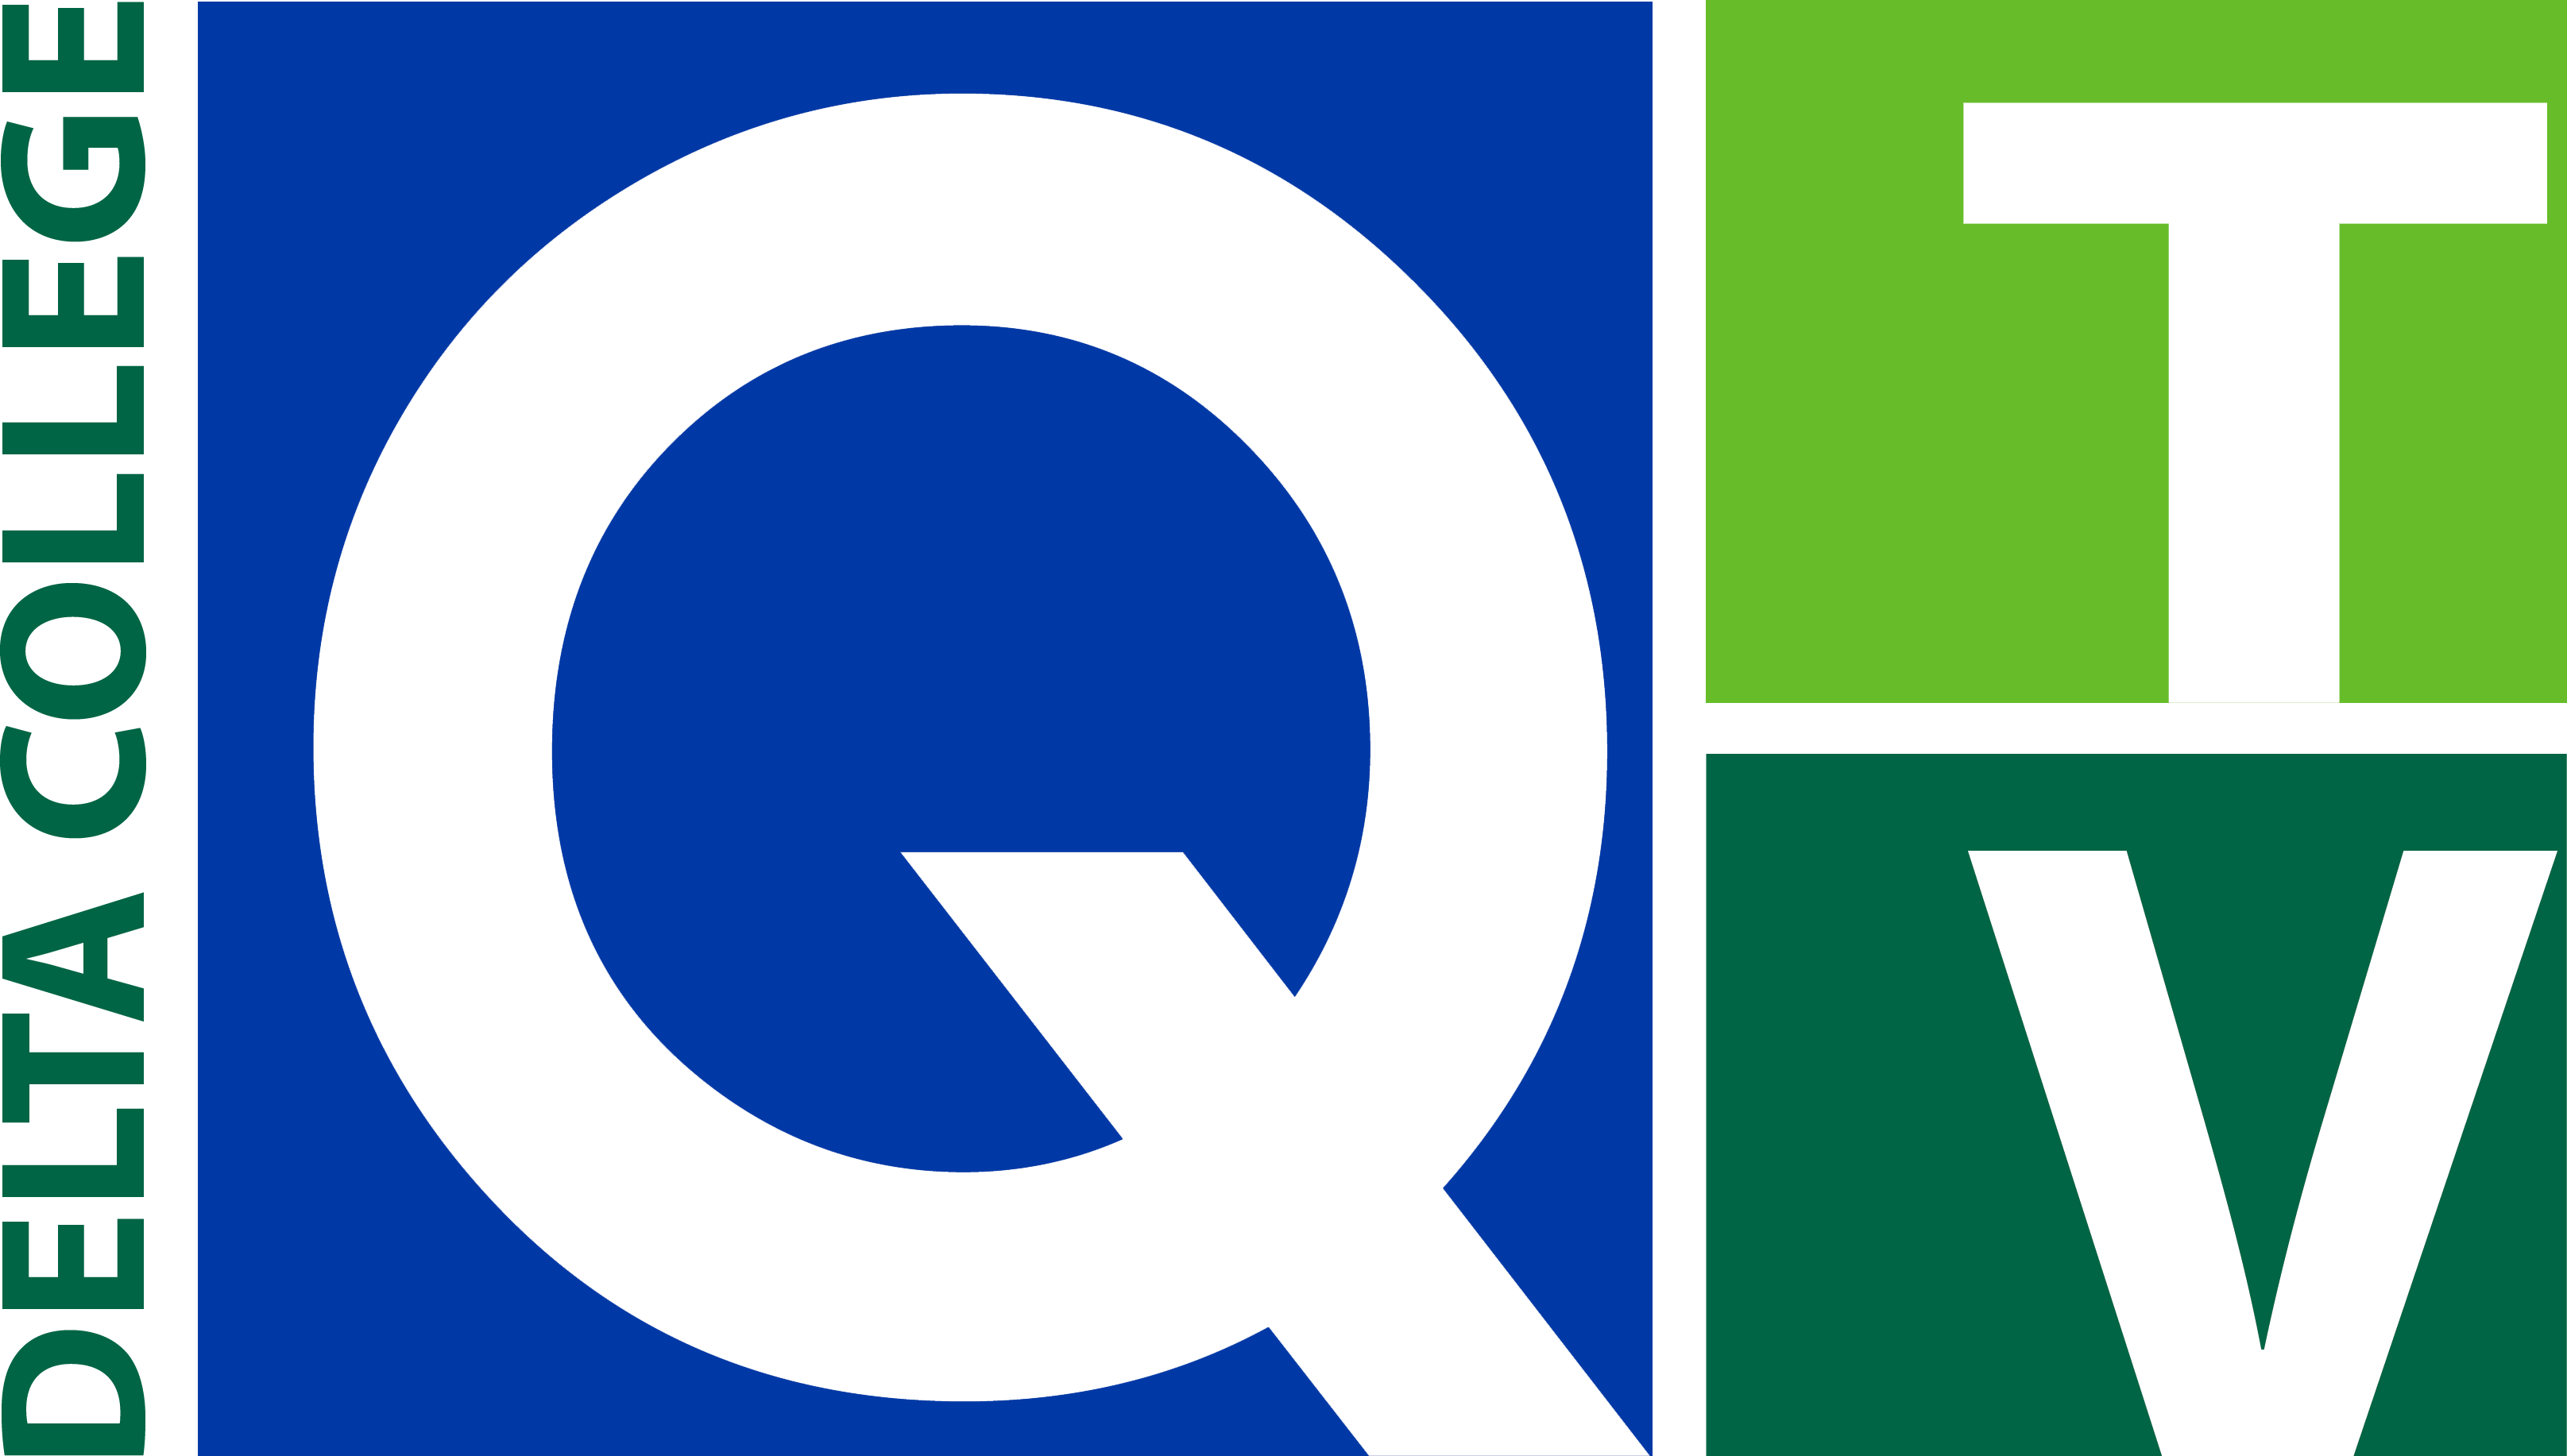 Q-TV Standard Logo